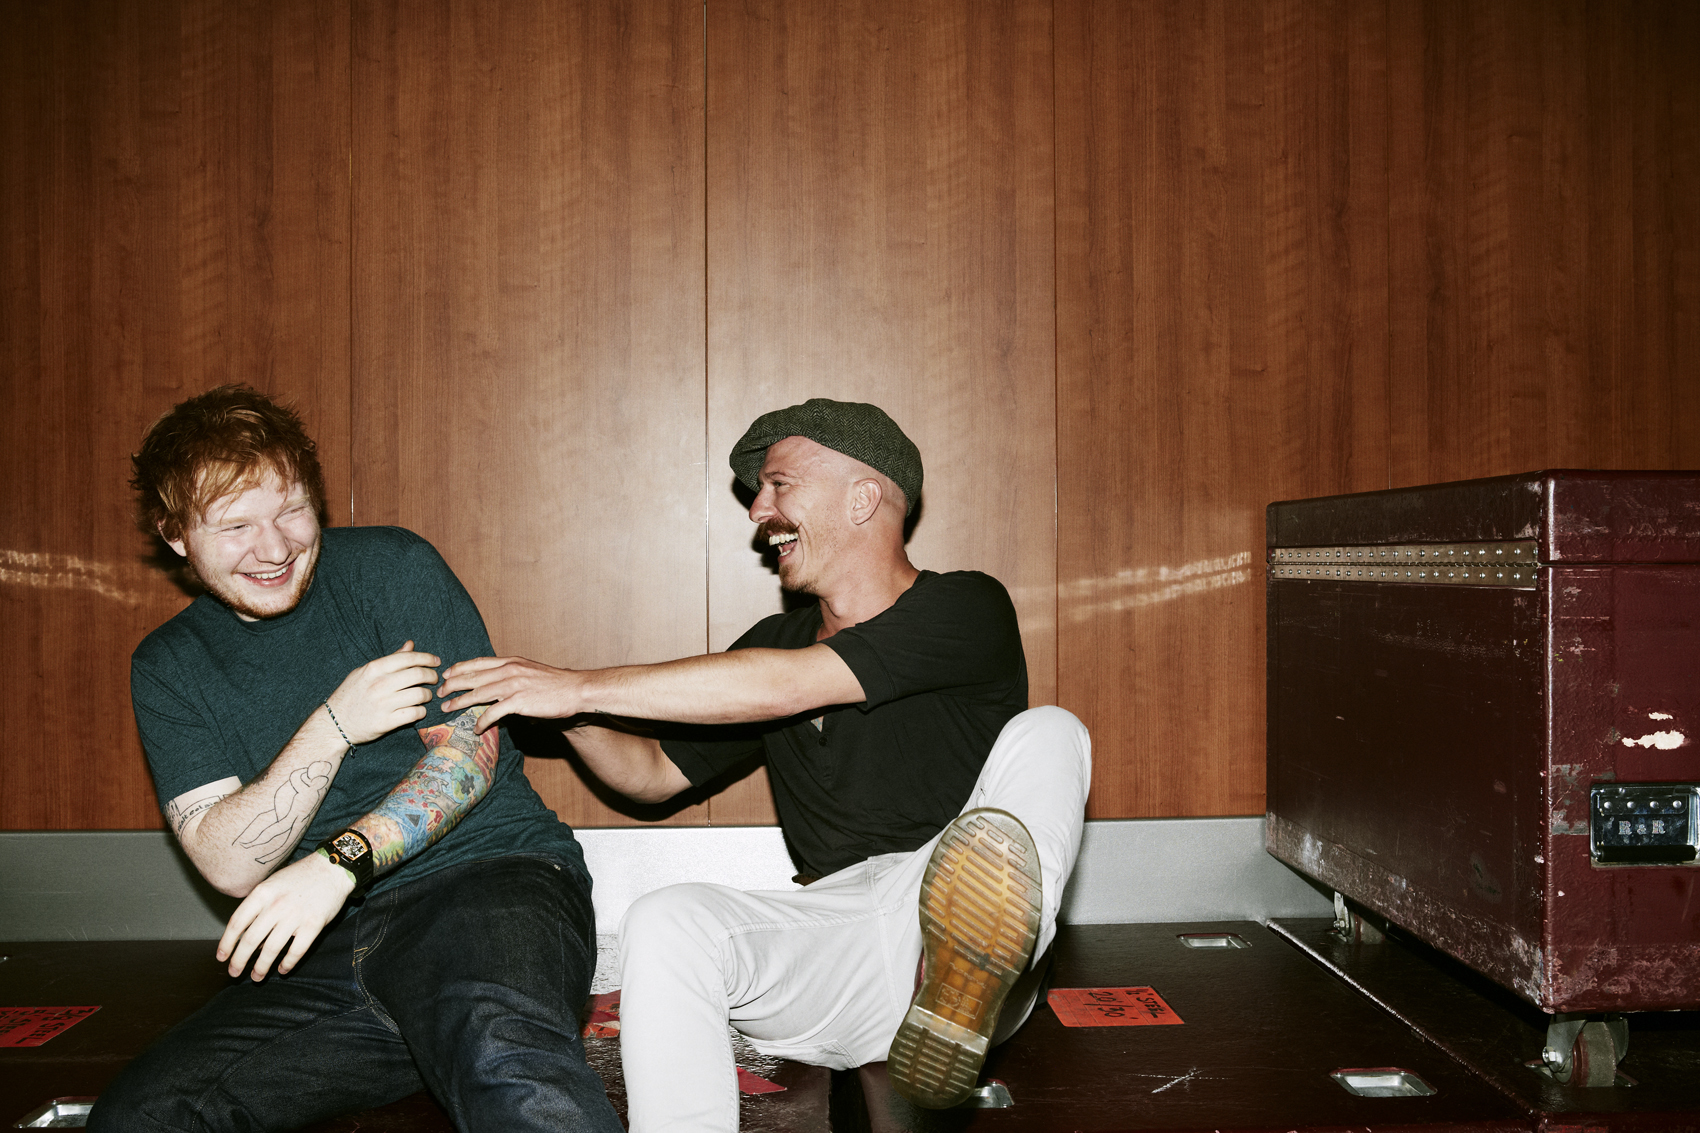 Ed Sheeran & Foy Vance